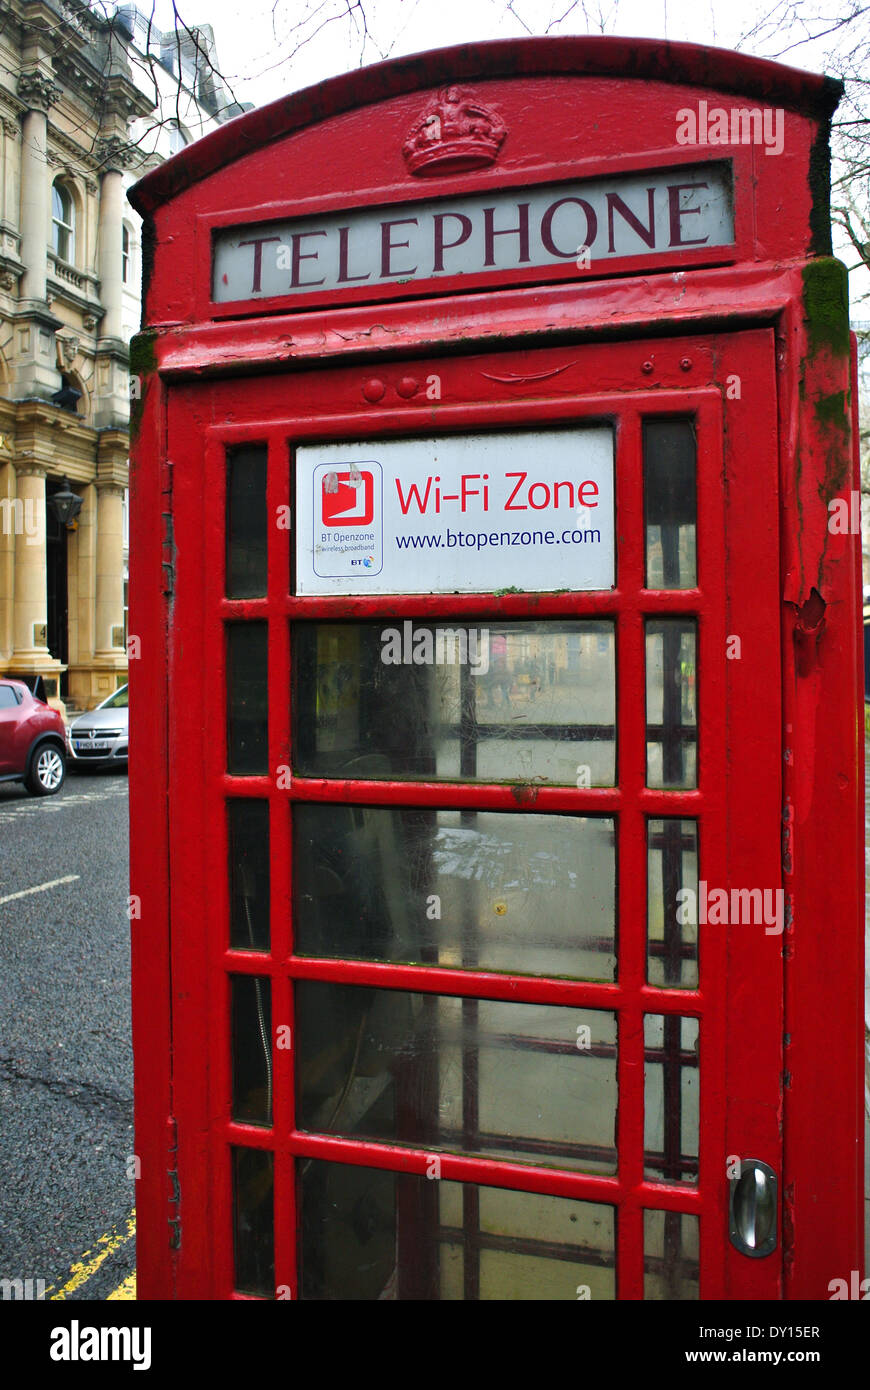 Boîte de téléphone wi-fi Zone www.btopenzone.com Photo Stock